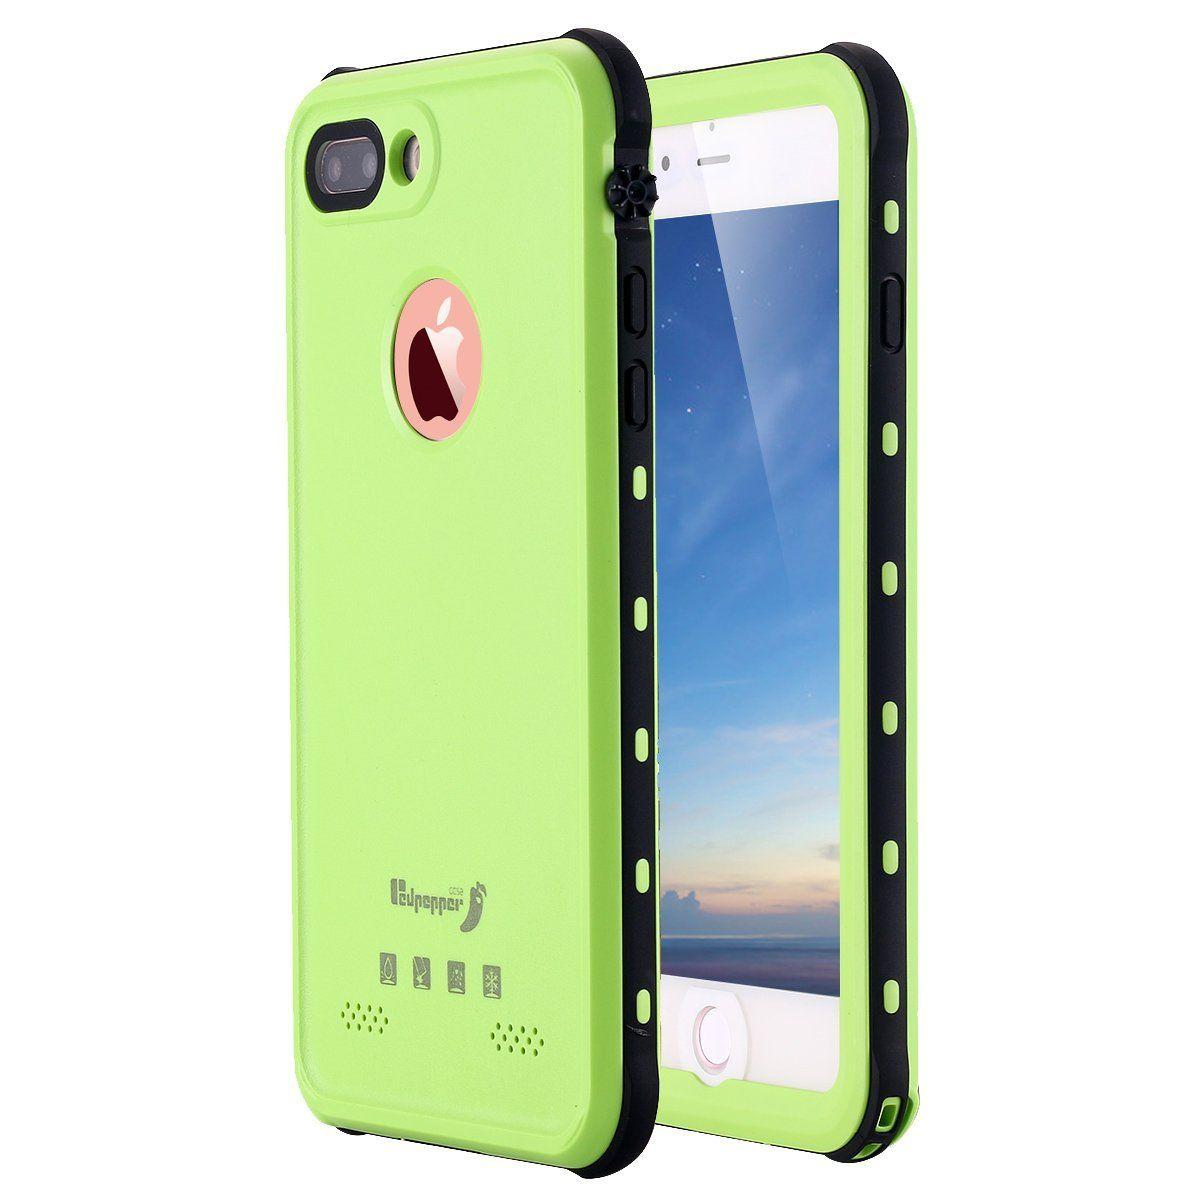 timeless design 111de 97af6 iPhone 8 Plus Waterproof Case, iPhone 7 Plus Waterproof Case ...